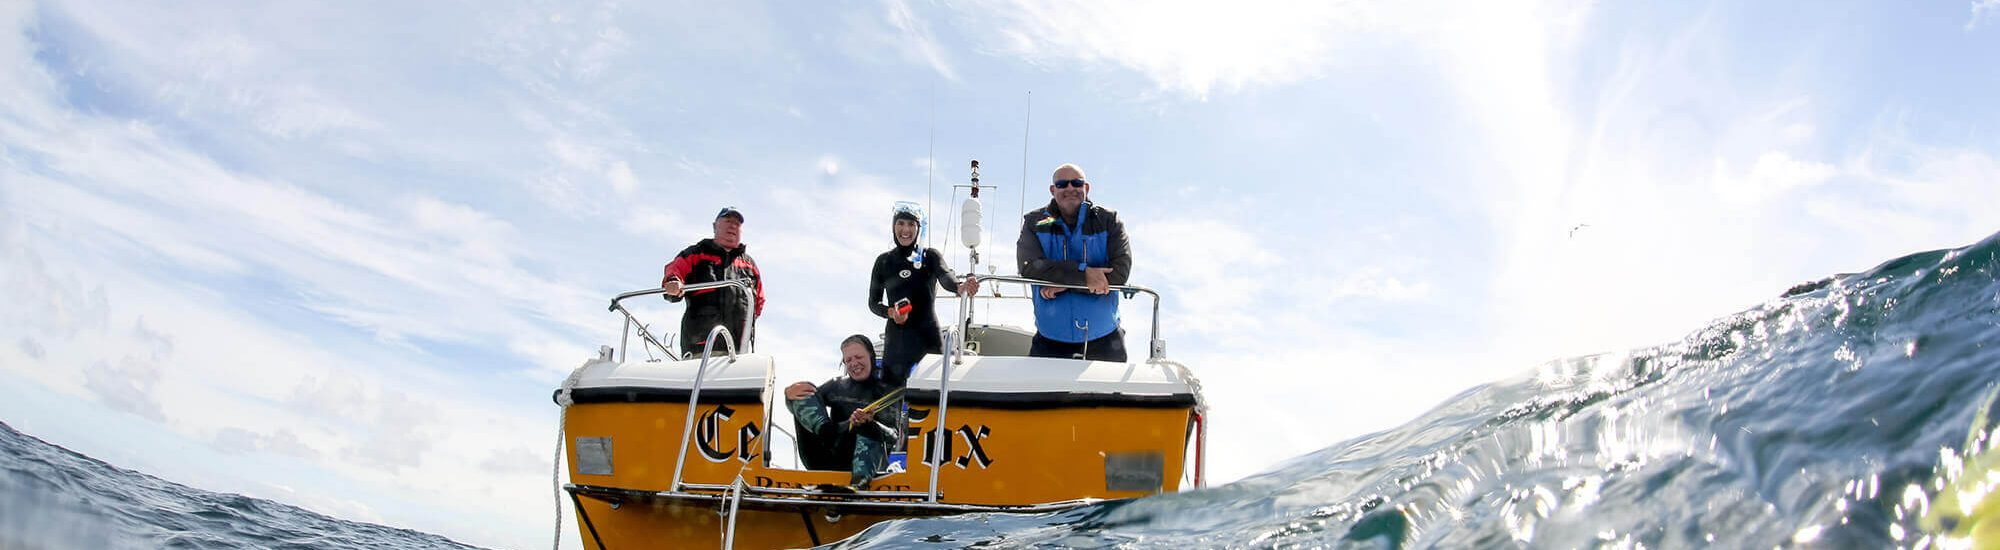 blue shark snorkel boat 2000x550 - The Boat